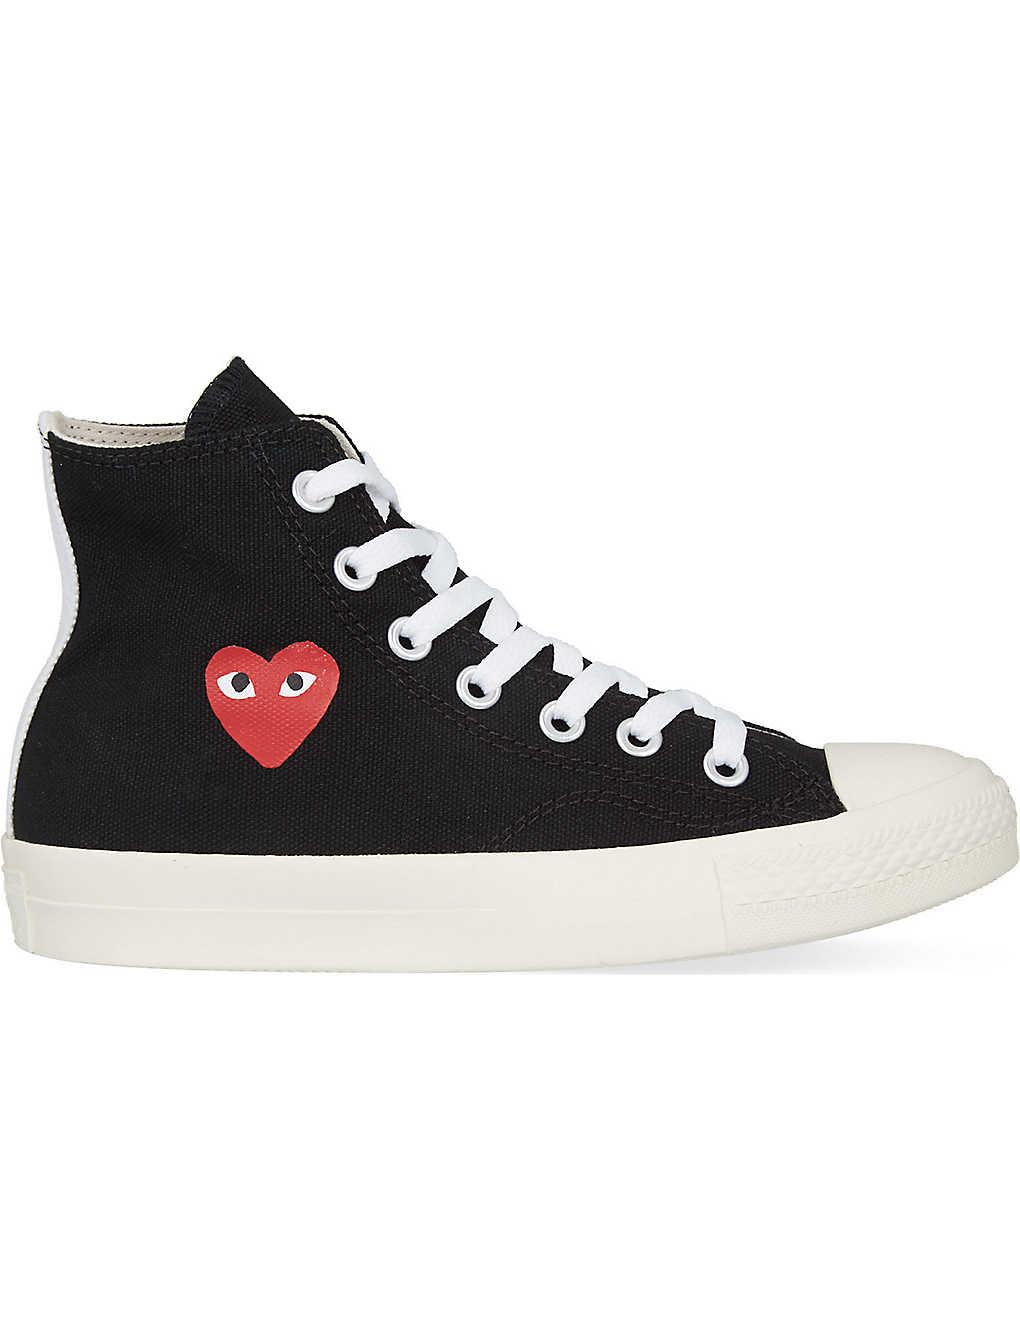 Comme Des Garcons Converse Canvas High Top Trainers D Island Shoes Motif England Mens Low Merah No Recent Searches